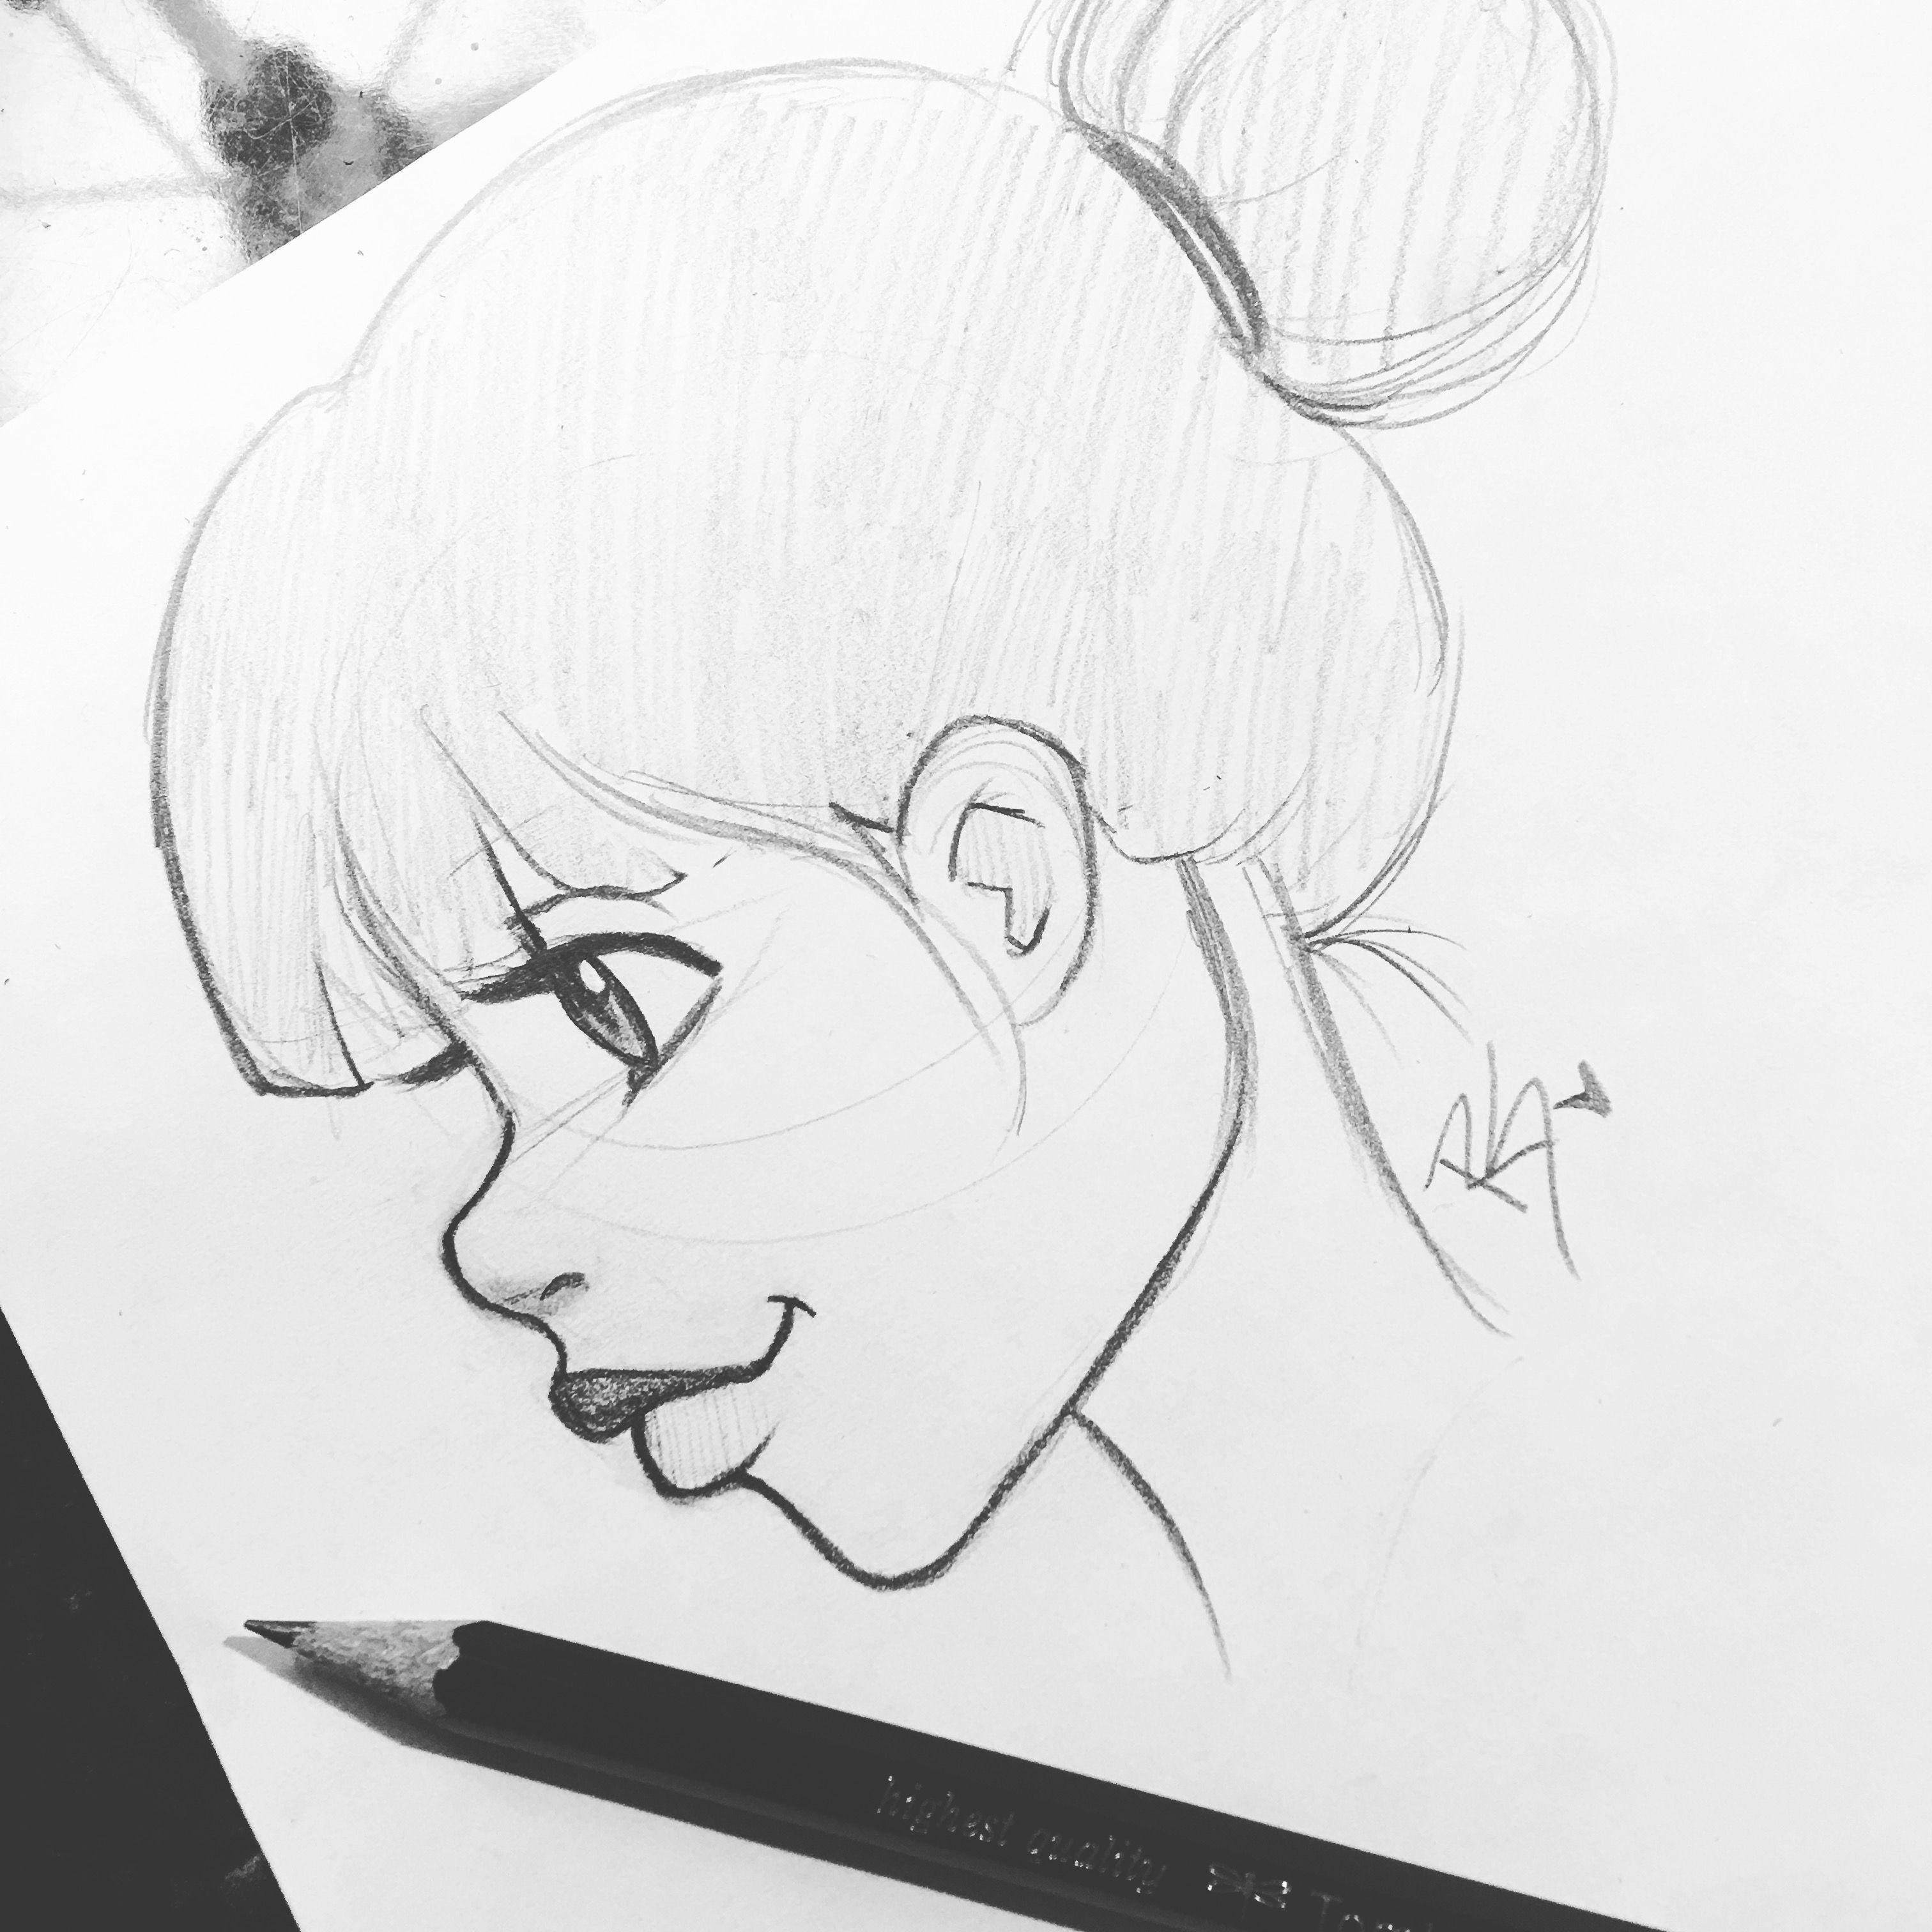 christina lorre easy drawings pretty drawings cartoon drawings manga drawing drawing